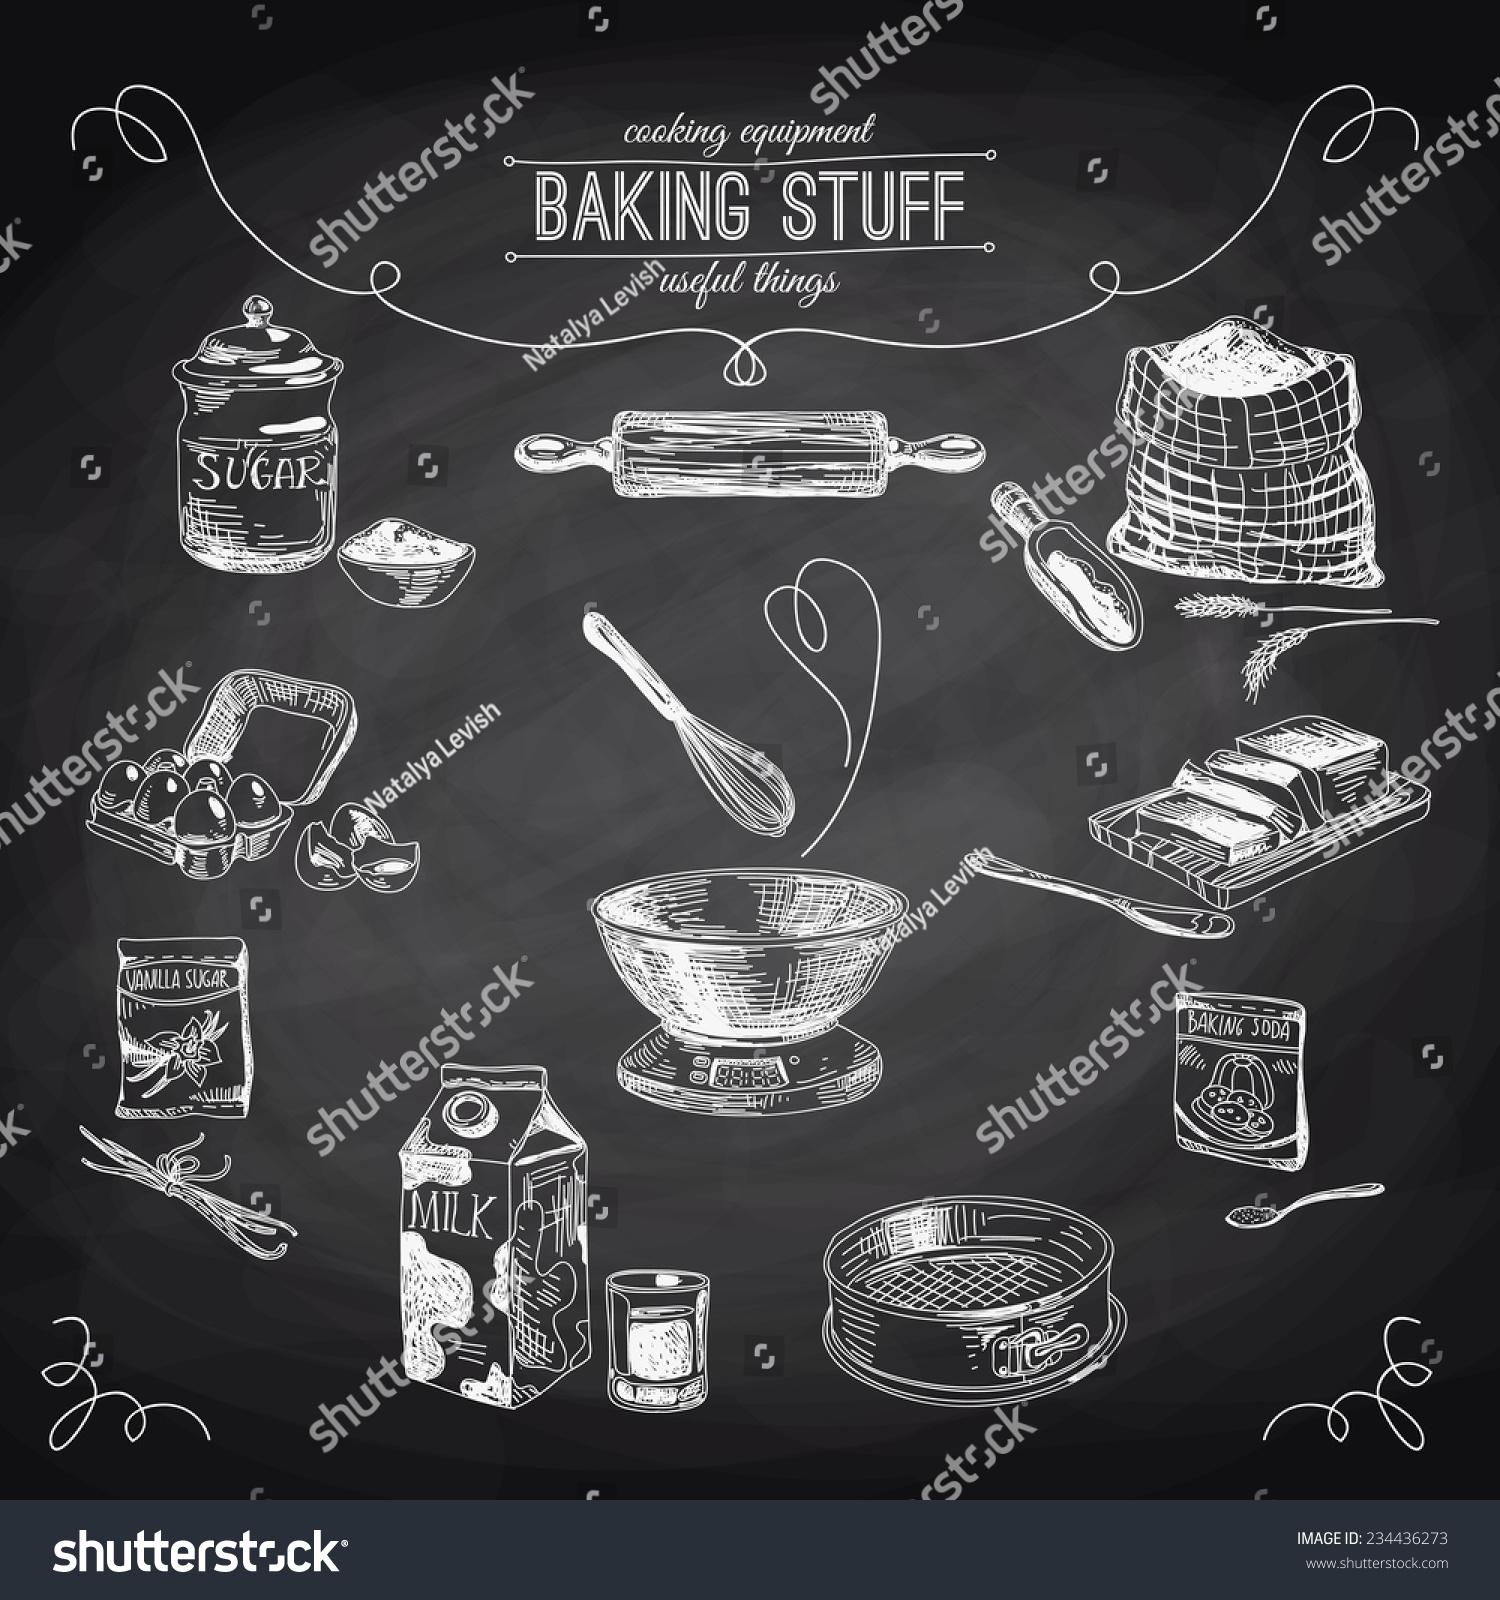 baking powder nederlands